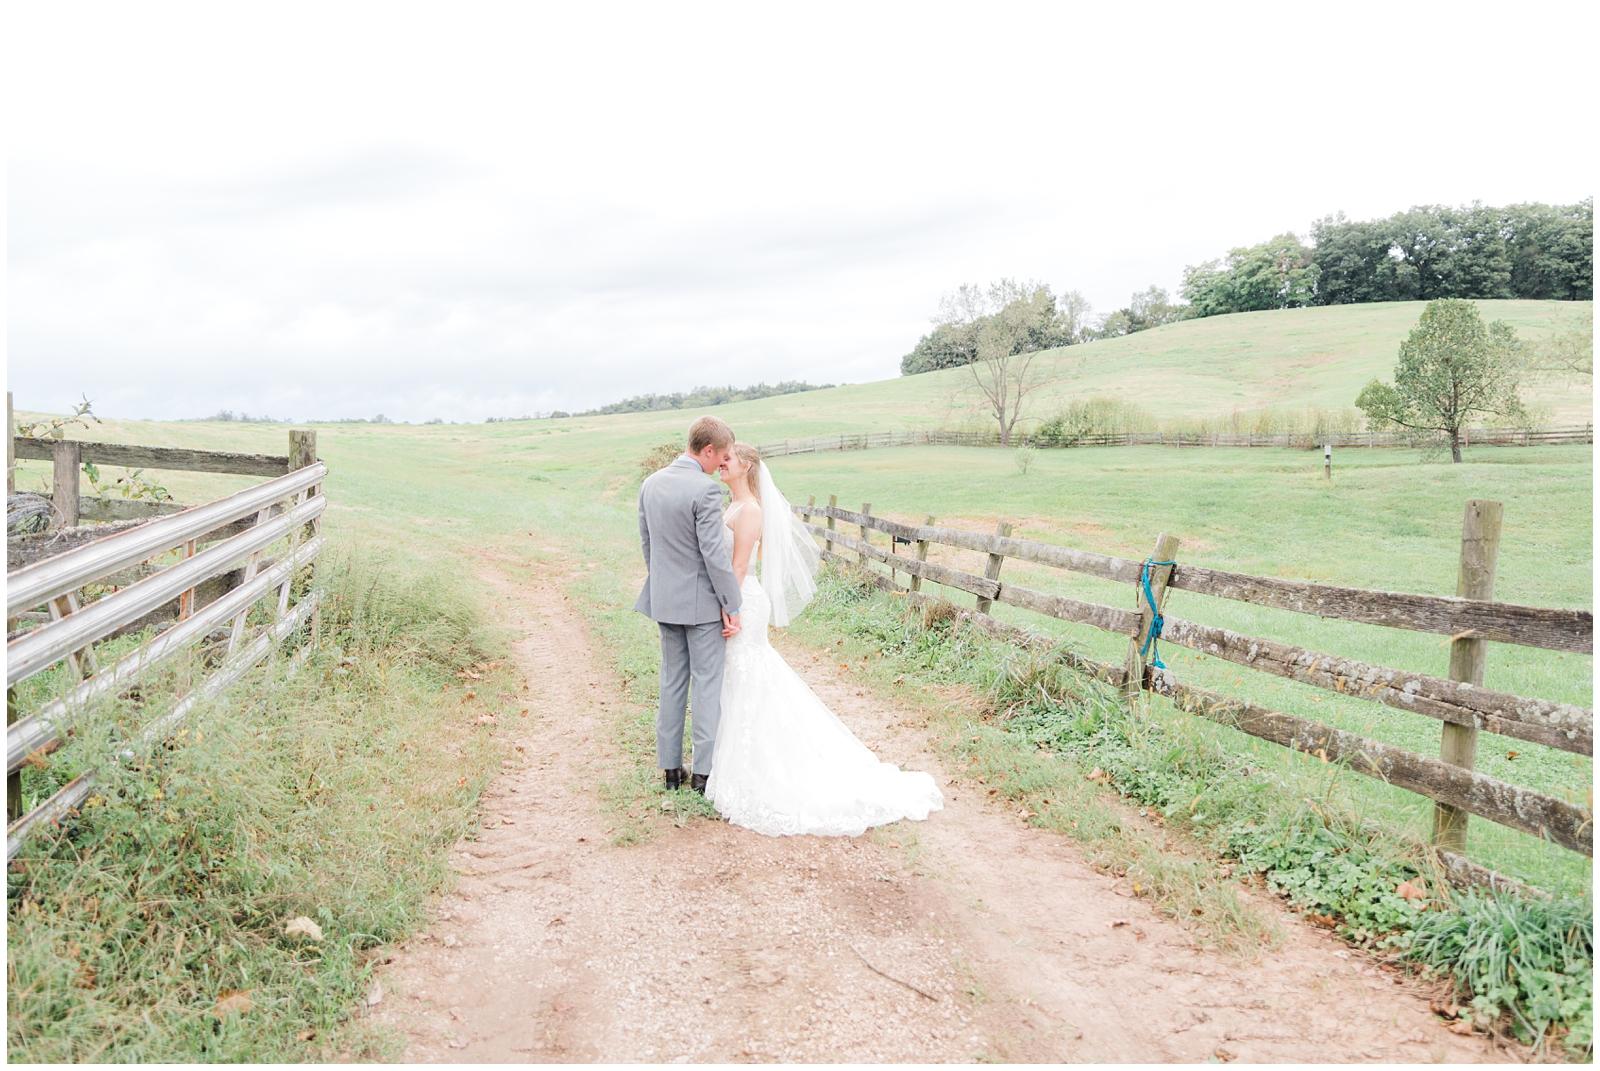 marietta-ohio-fall-wedding-LRA-Photo_0019.jpg